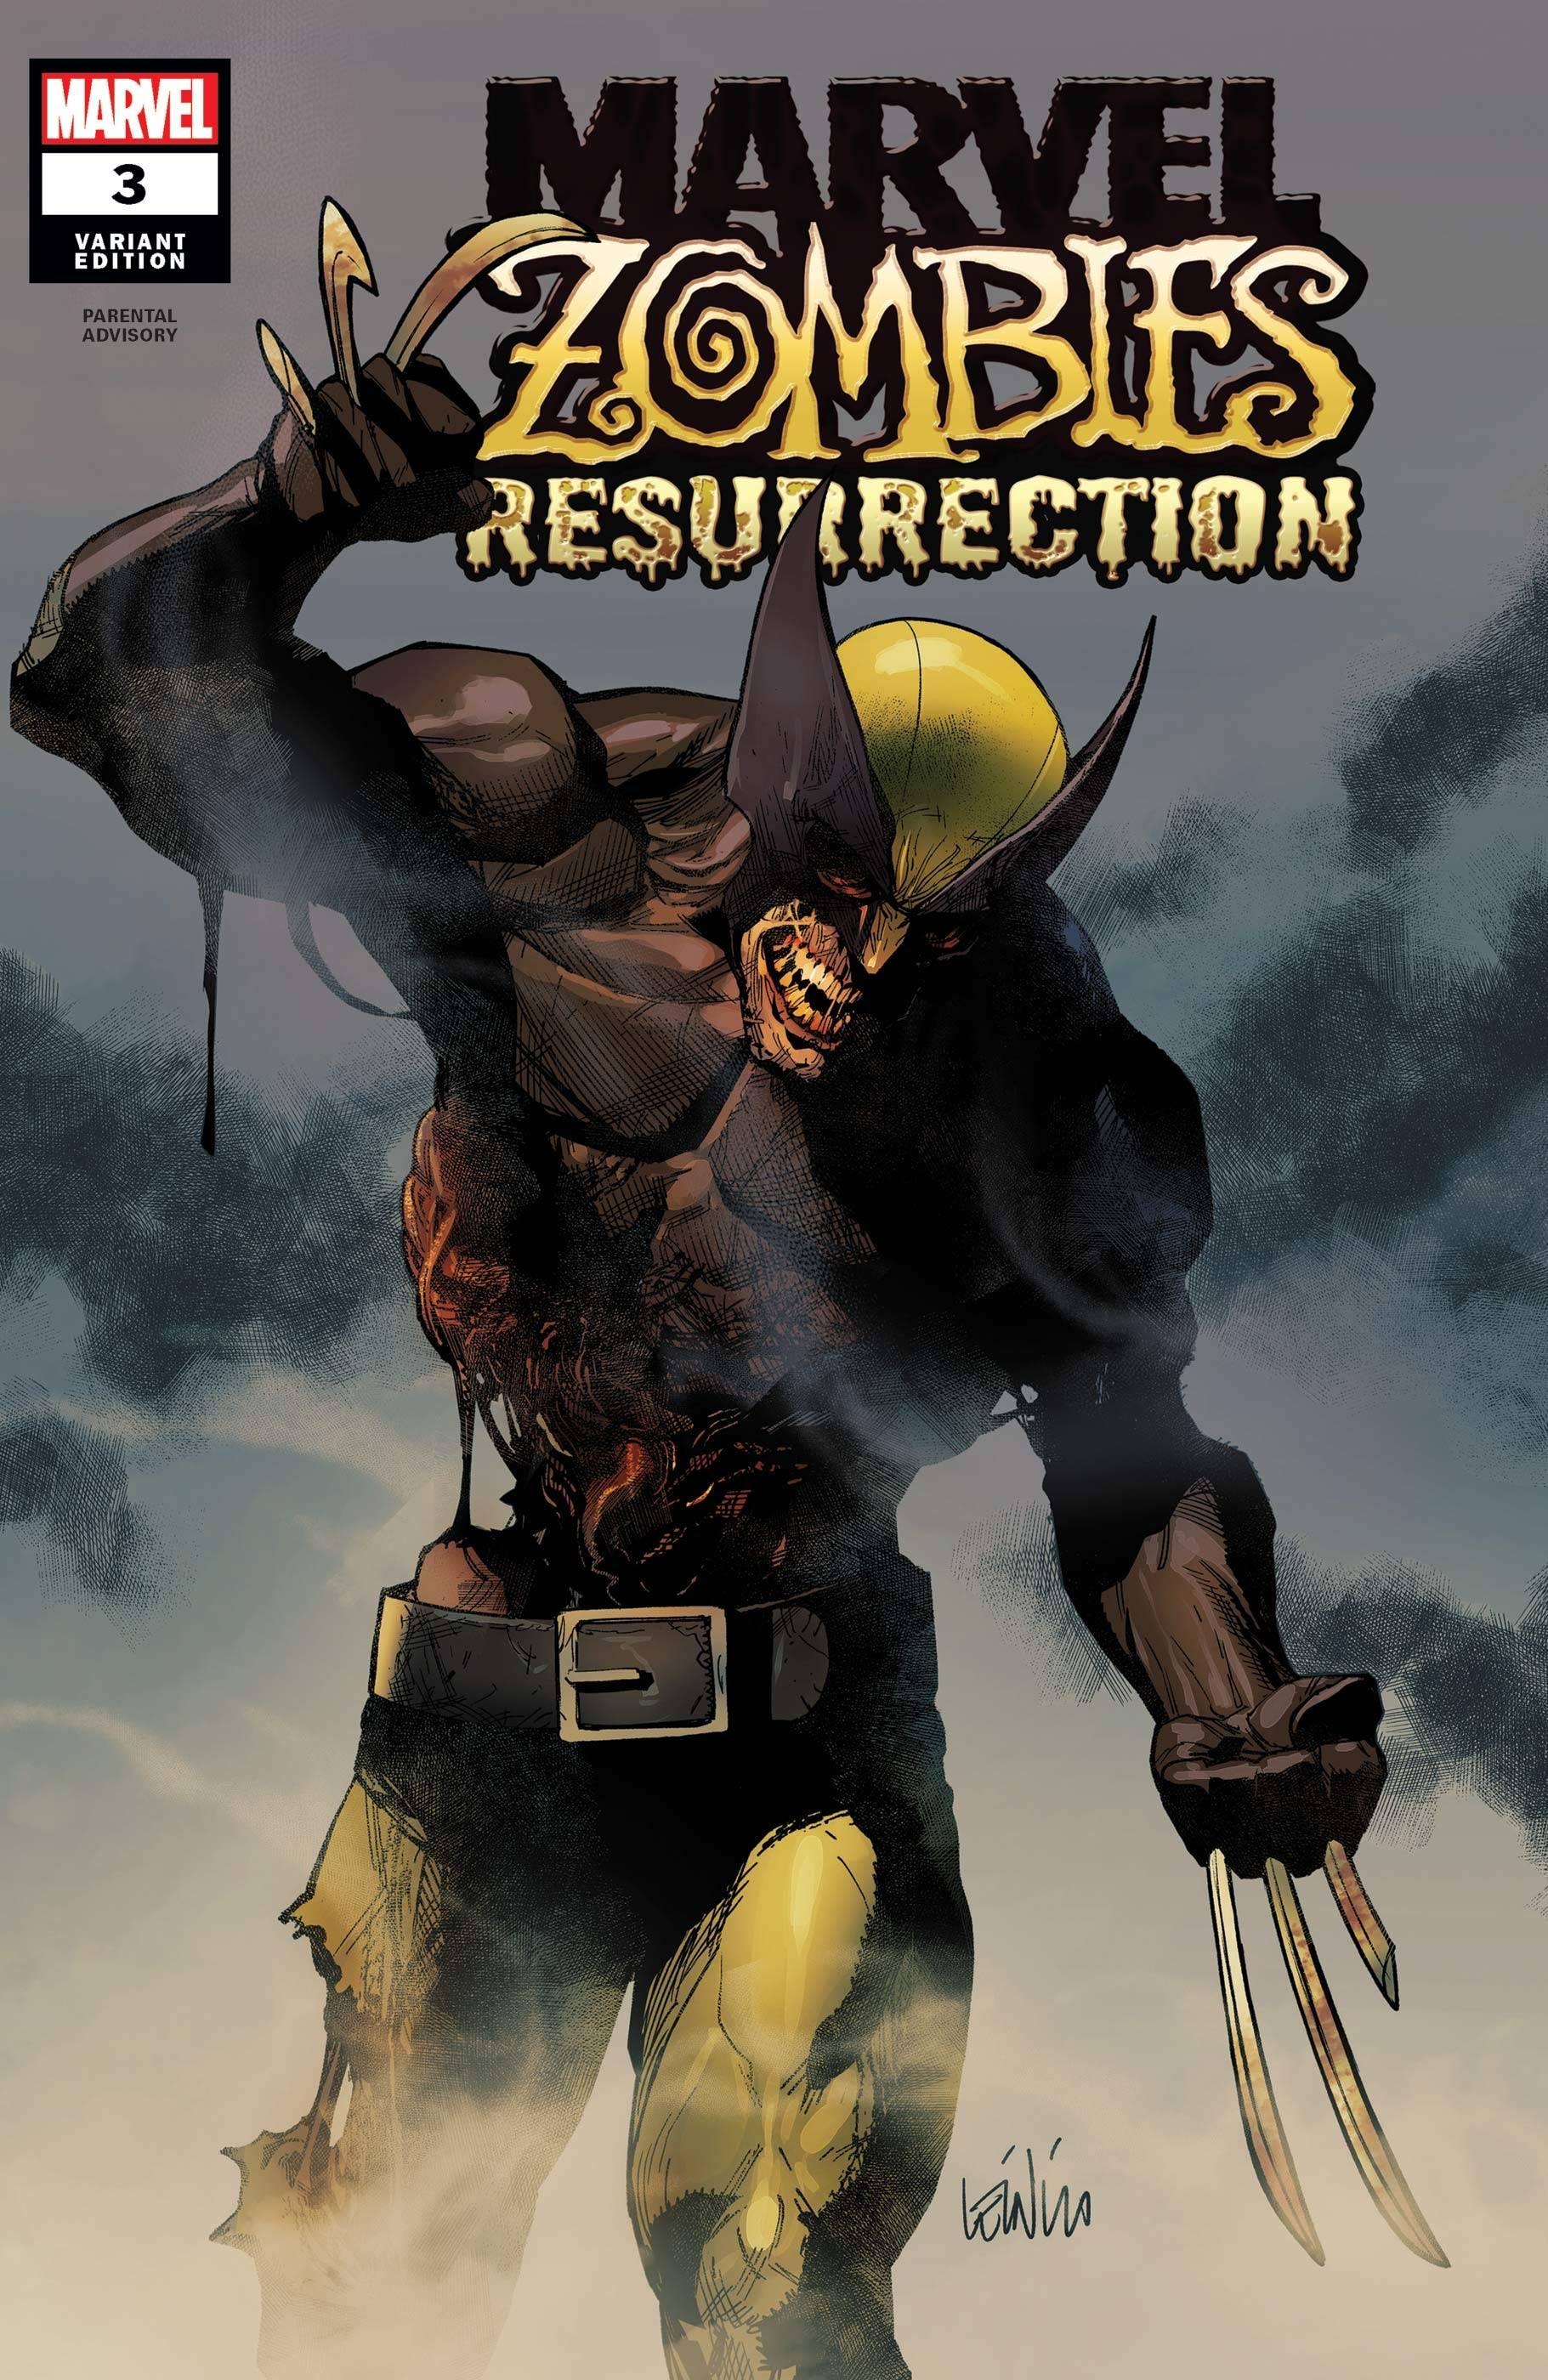 Marvel Zombies Resurrection Vol 2 3 Yu Variant.jpg